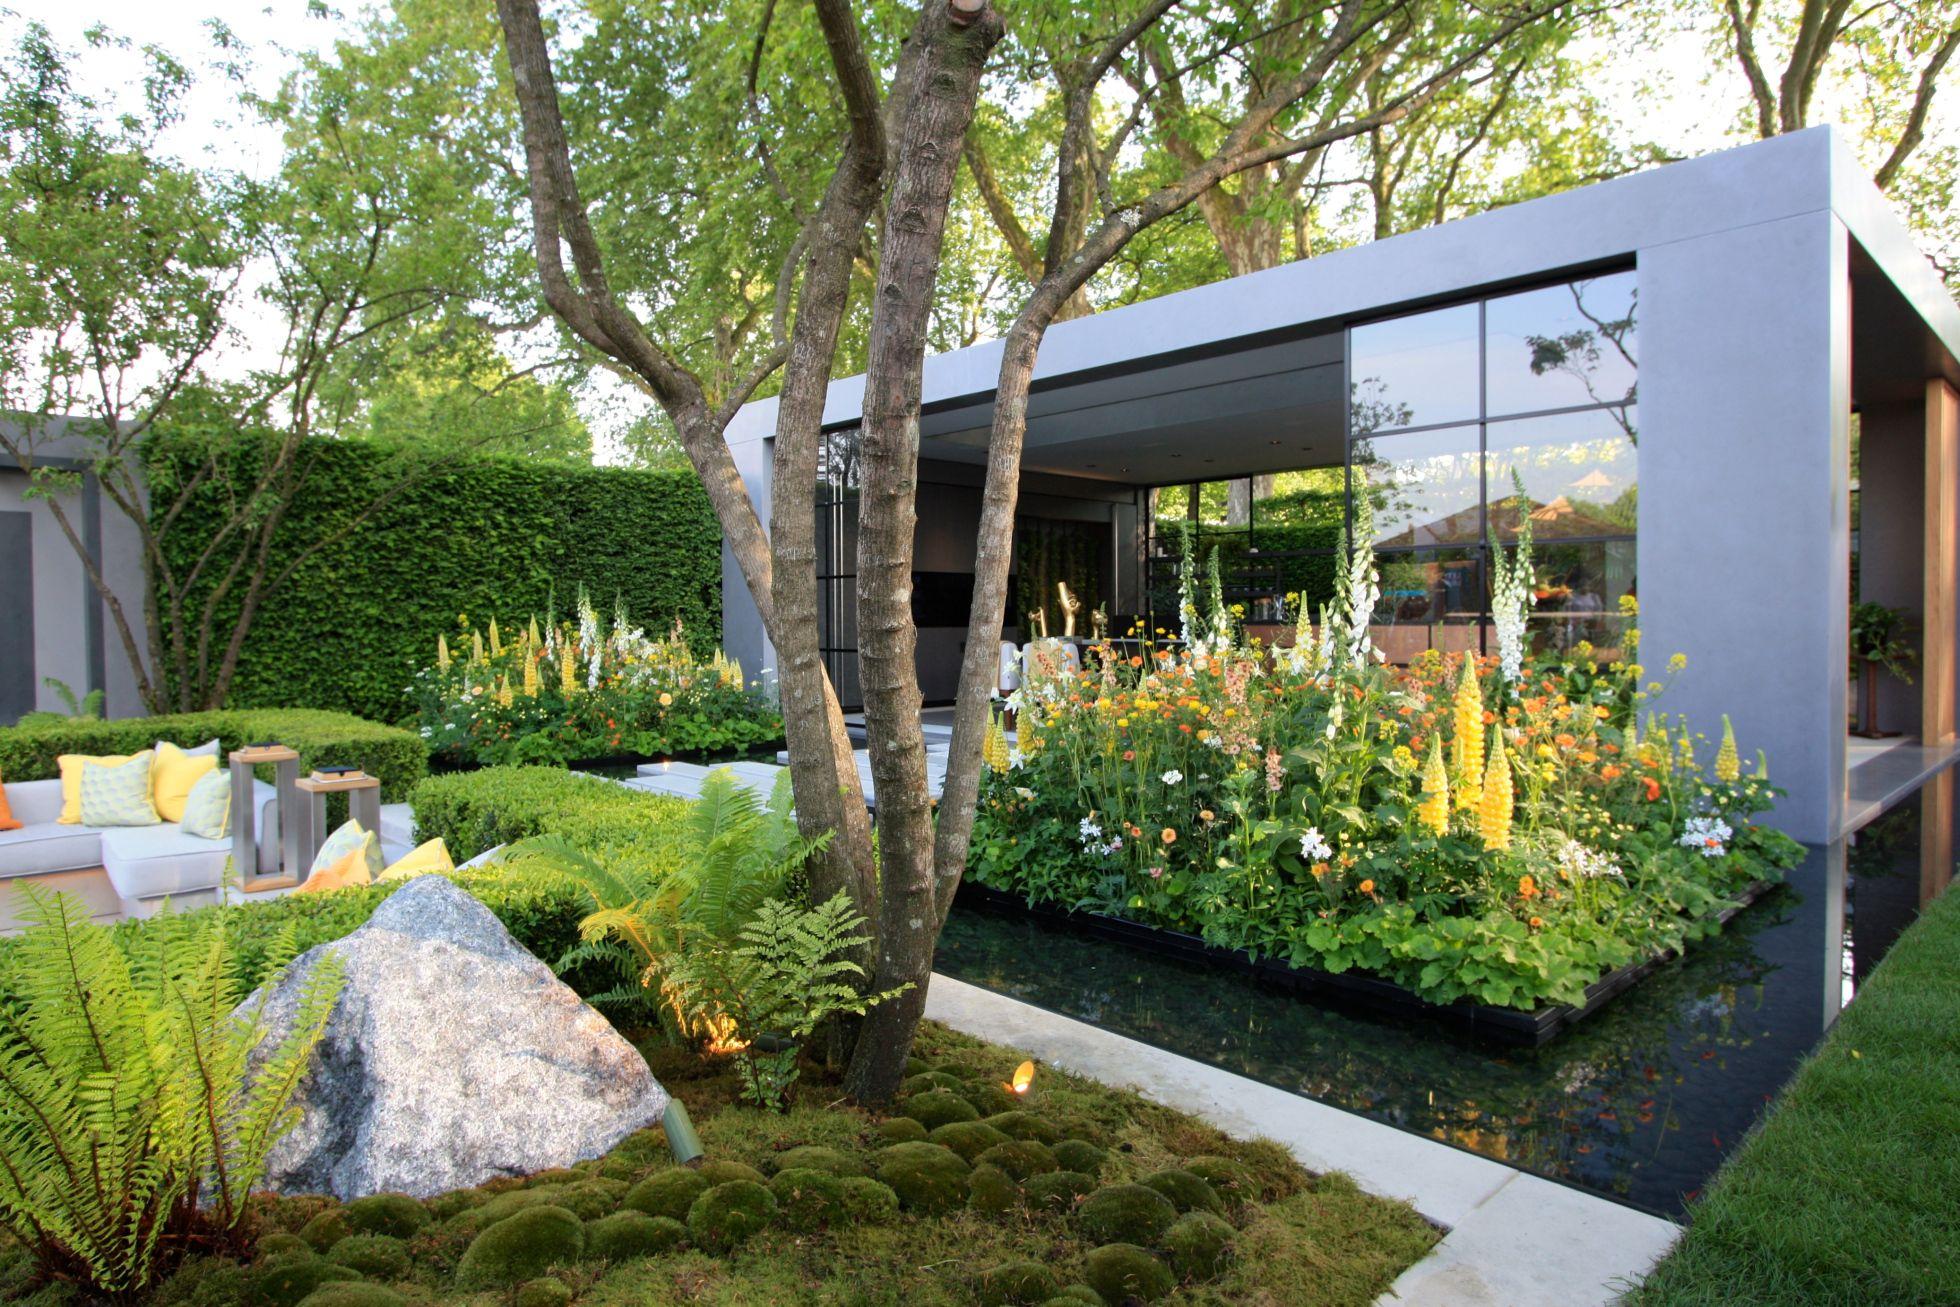 Chelsea Flower Show 2018 The LG EcoCity Garden  The Frustrated Gardener